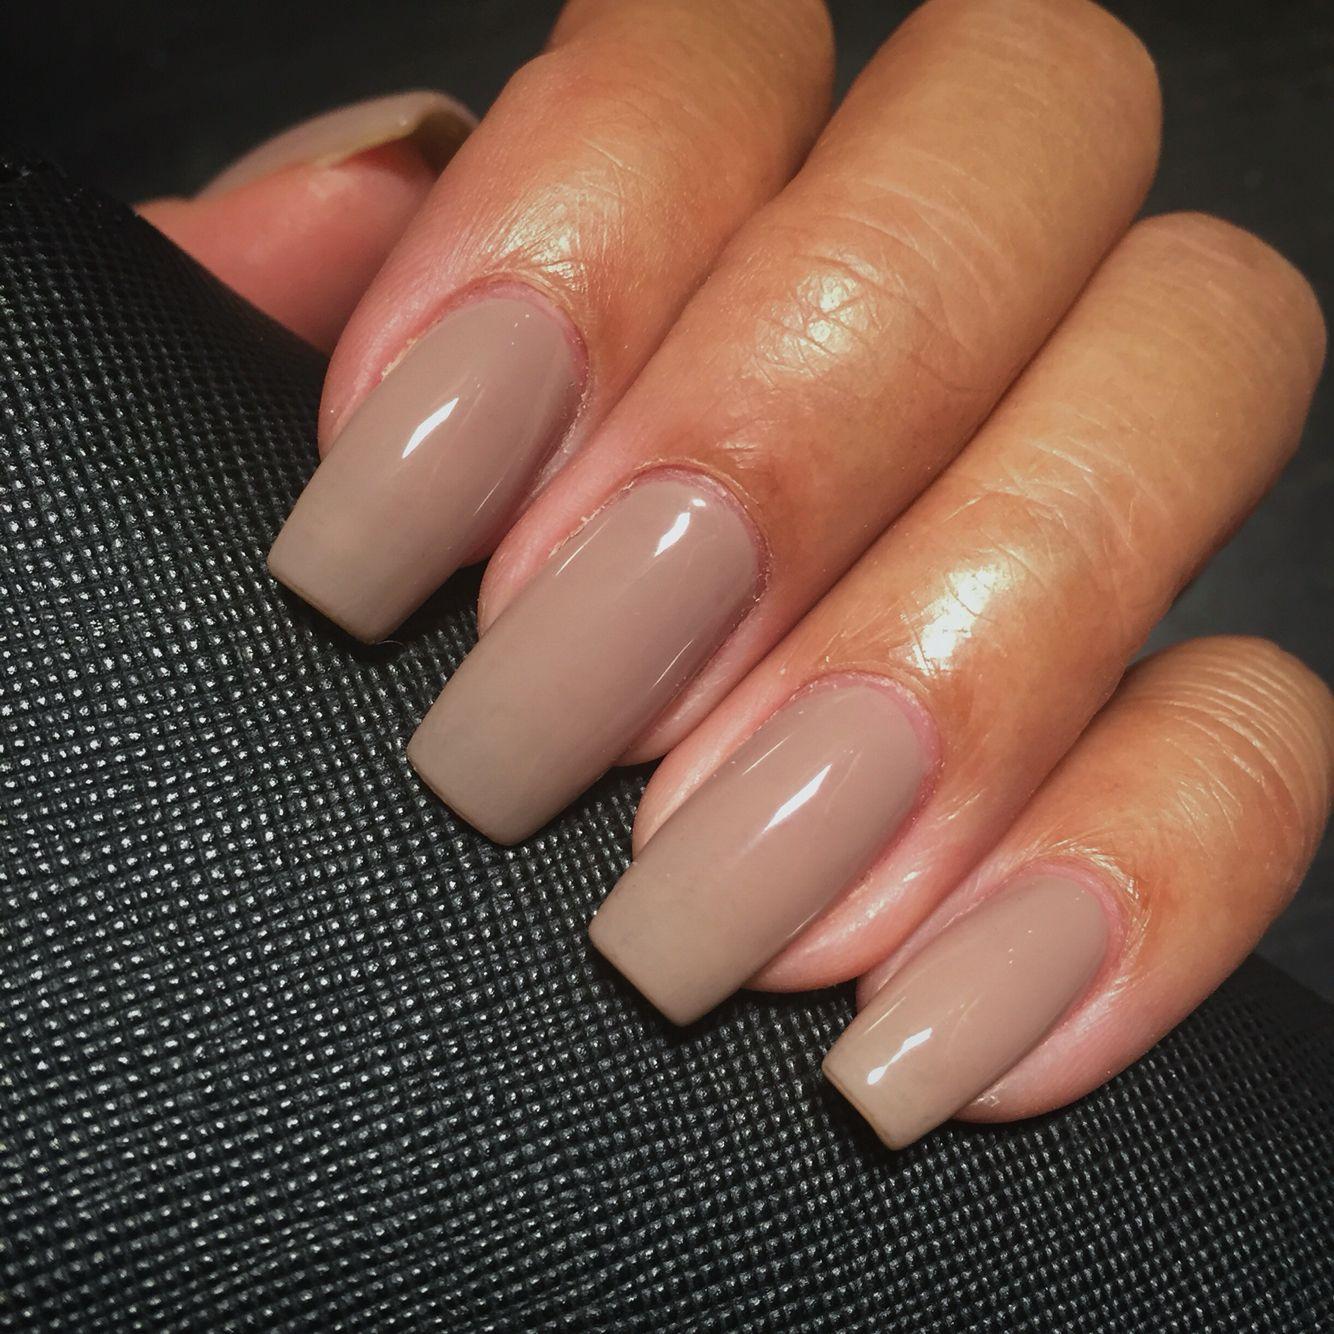 Mauve Color Nailart Nailpolish Sandiego Fashion Mauvenails Nudenails Mauve Nails Cute Acrylic Nails Nail Shapes Square